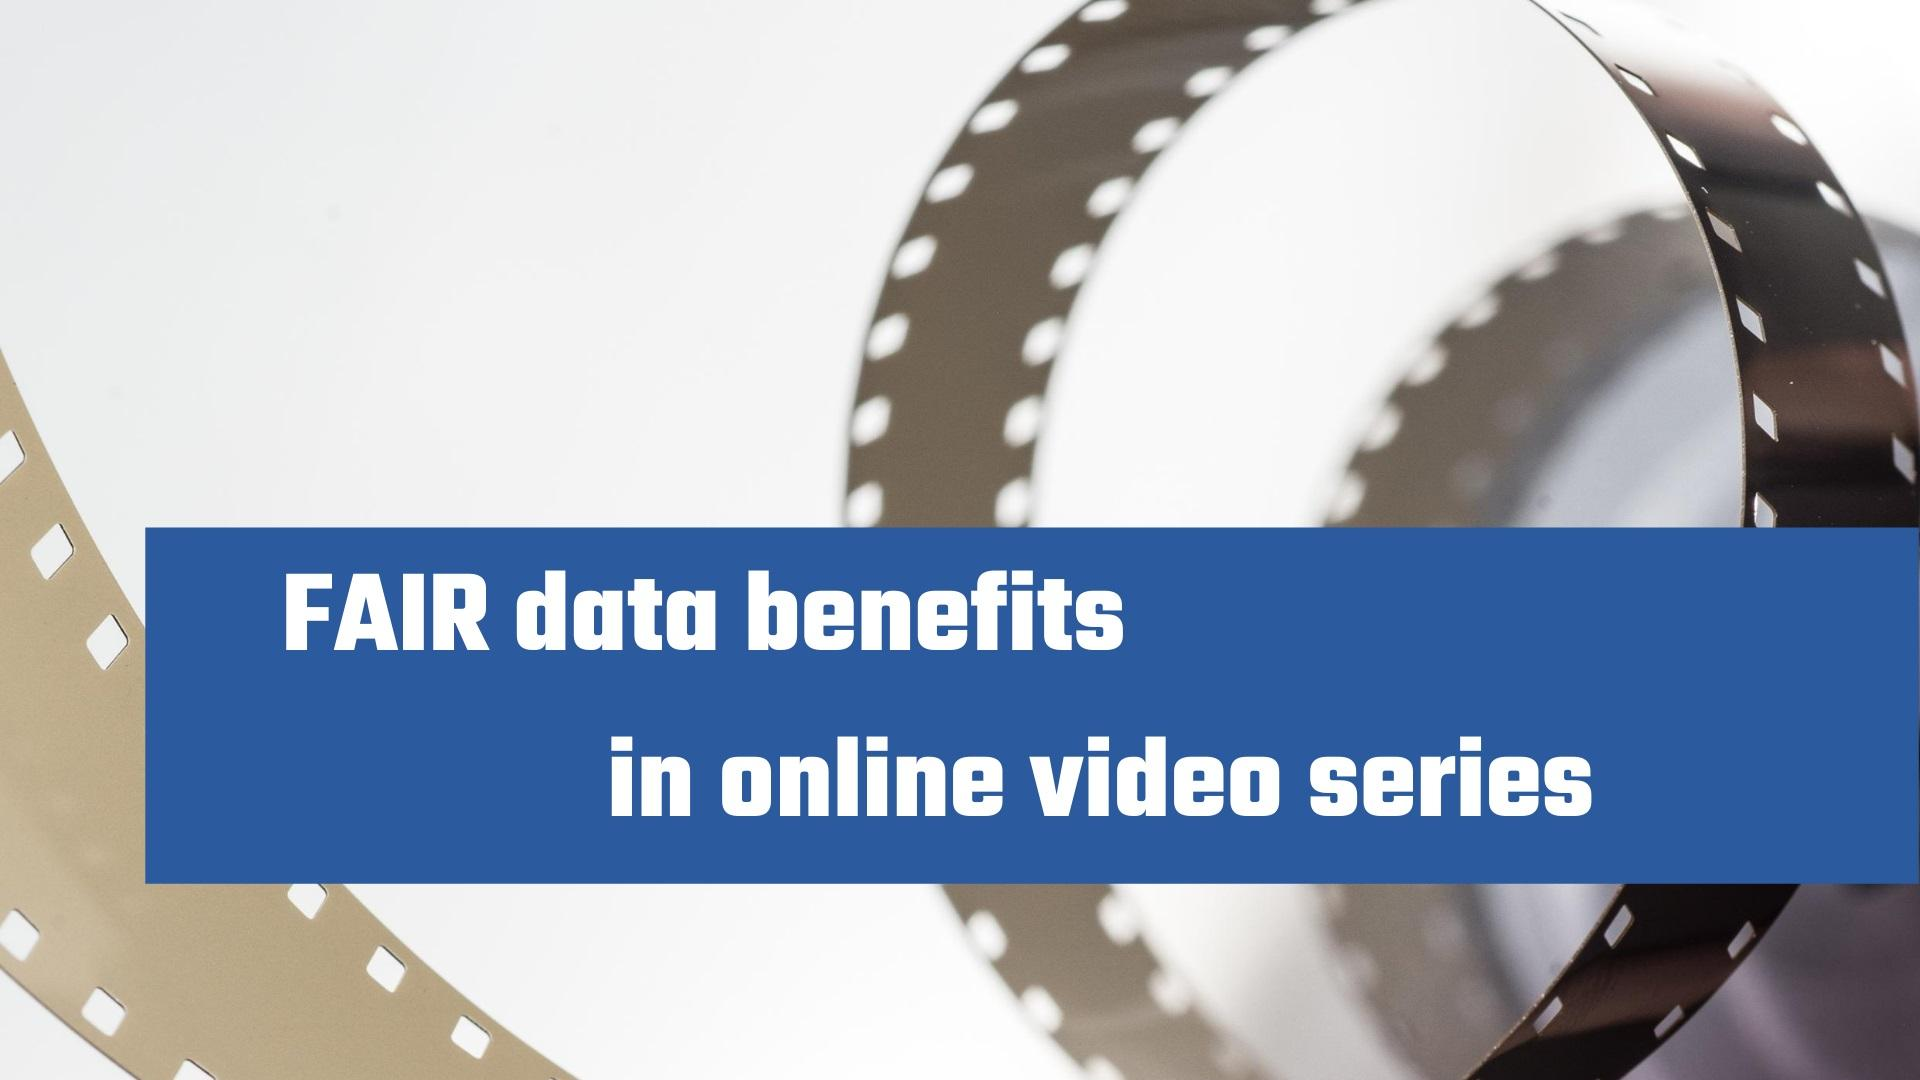 PaNOSC showcases FAIR data benefits in online video series